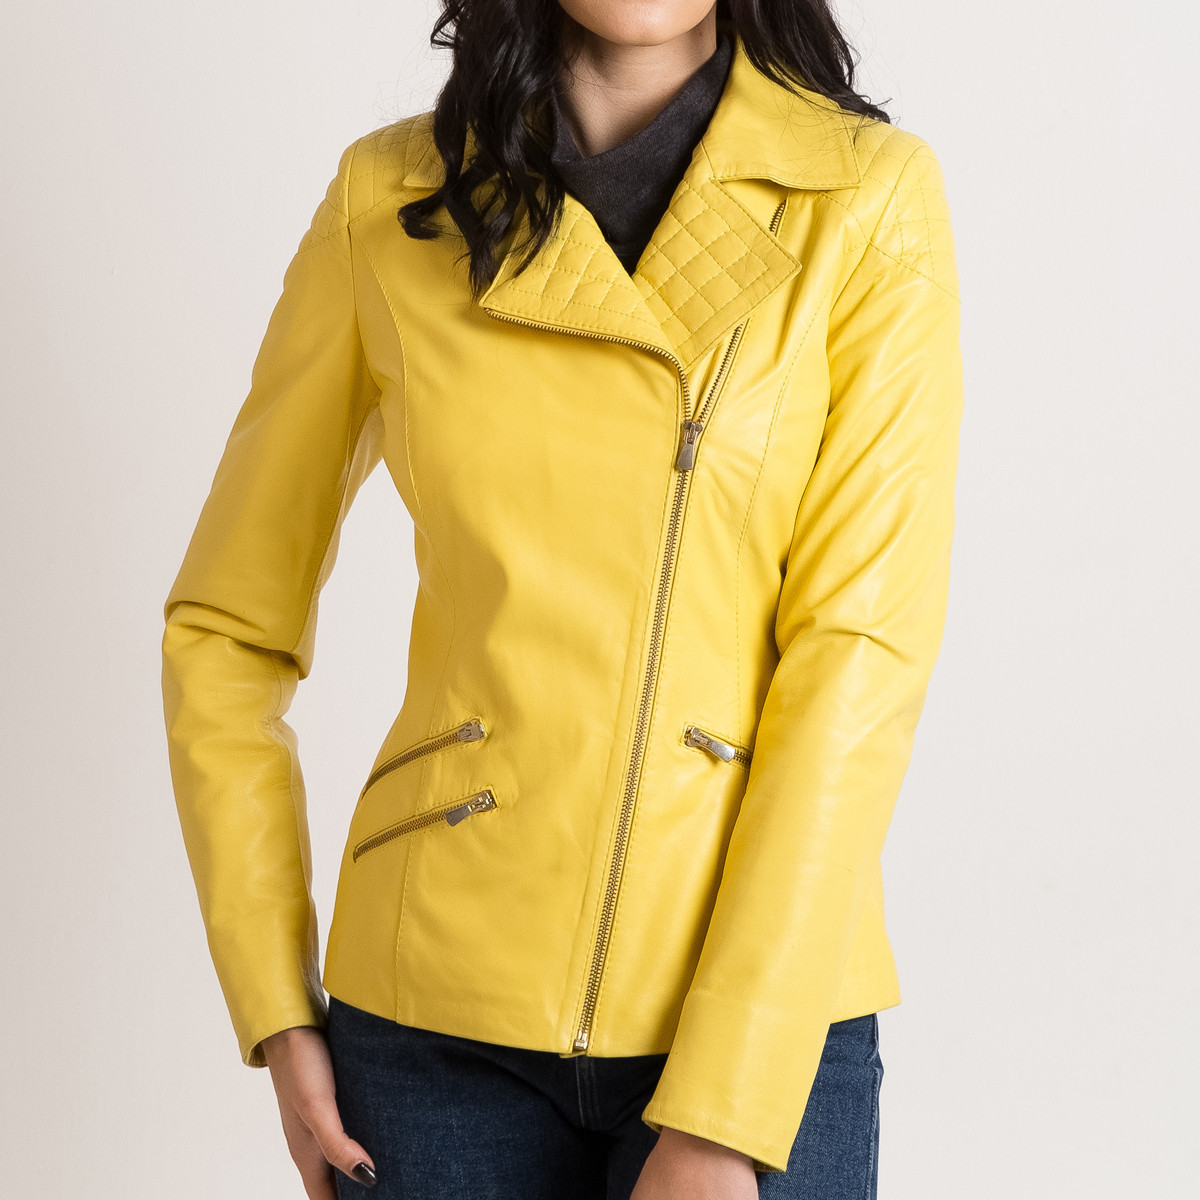 Желтая кожаная куртка женская короткая 46 размера (Арт. PAR291)